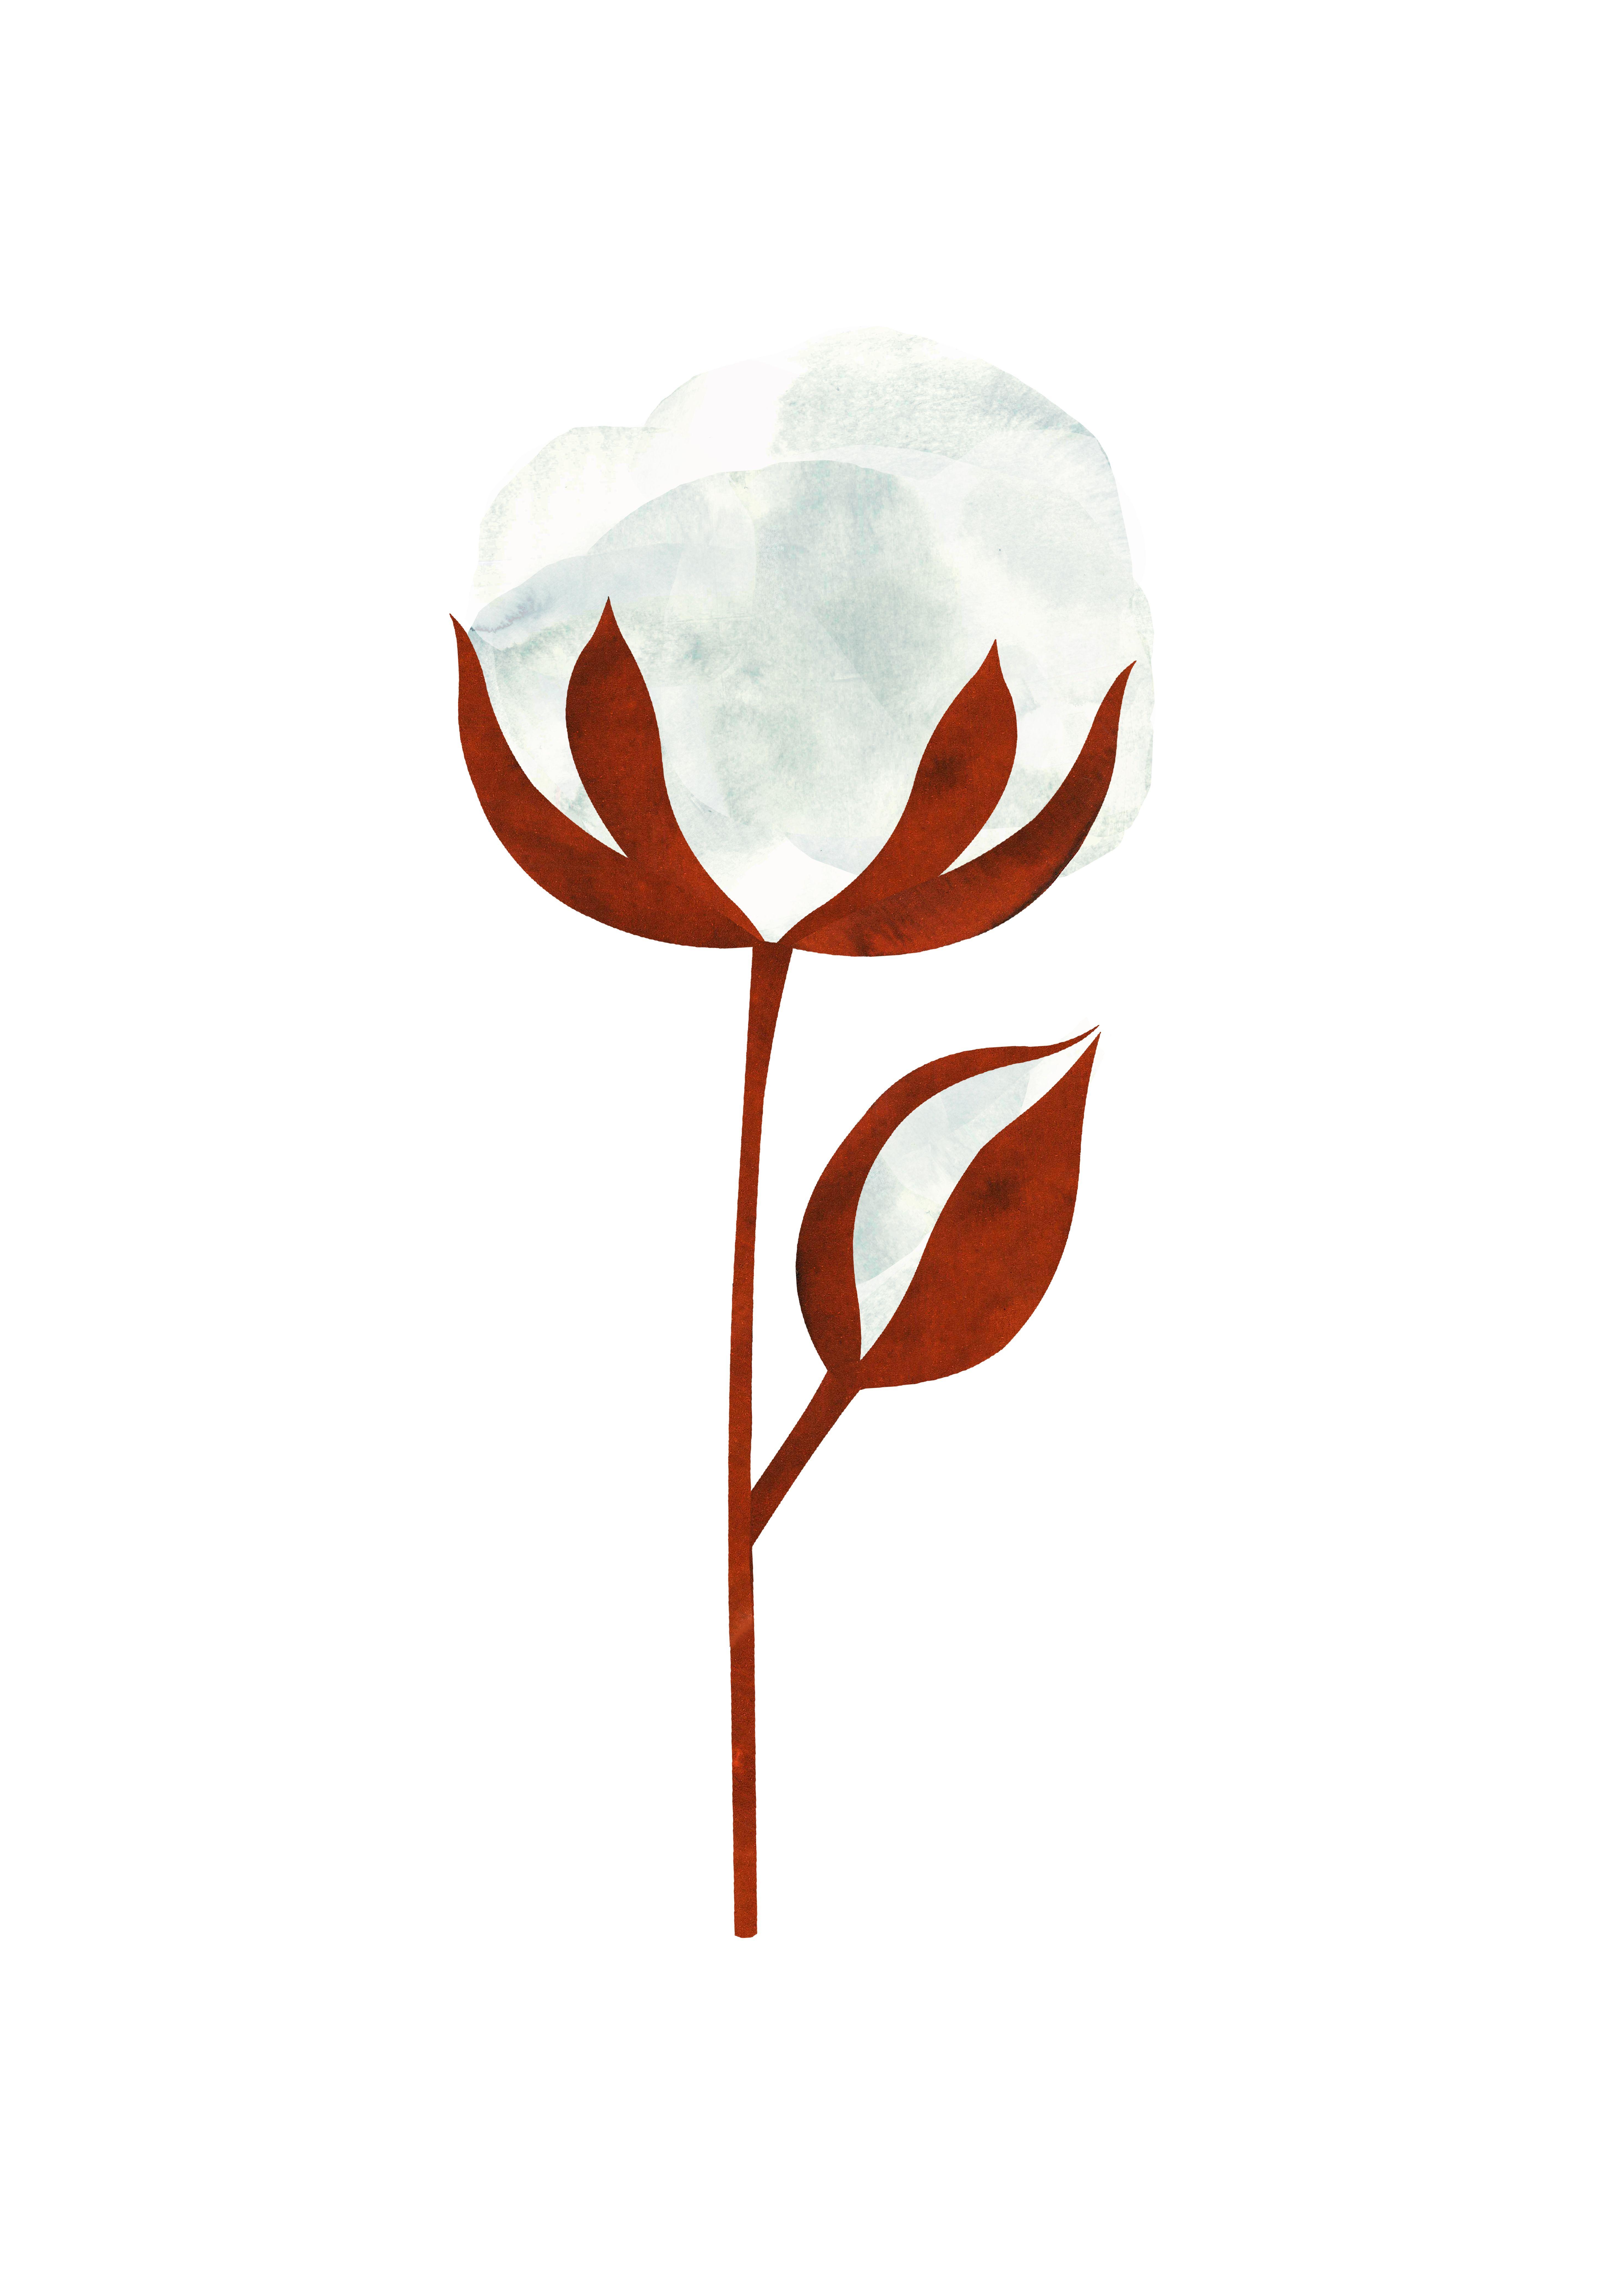 Cotton Flower Maria Leon Ilustracion De Flor Planta De Algodon Flor De Algodon